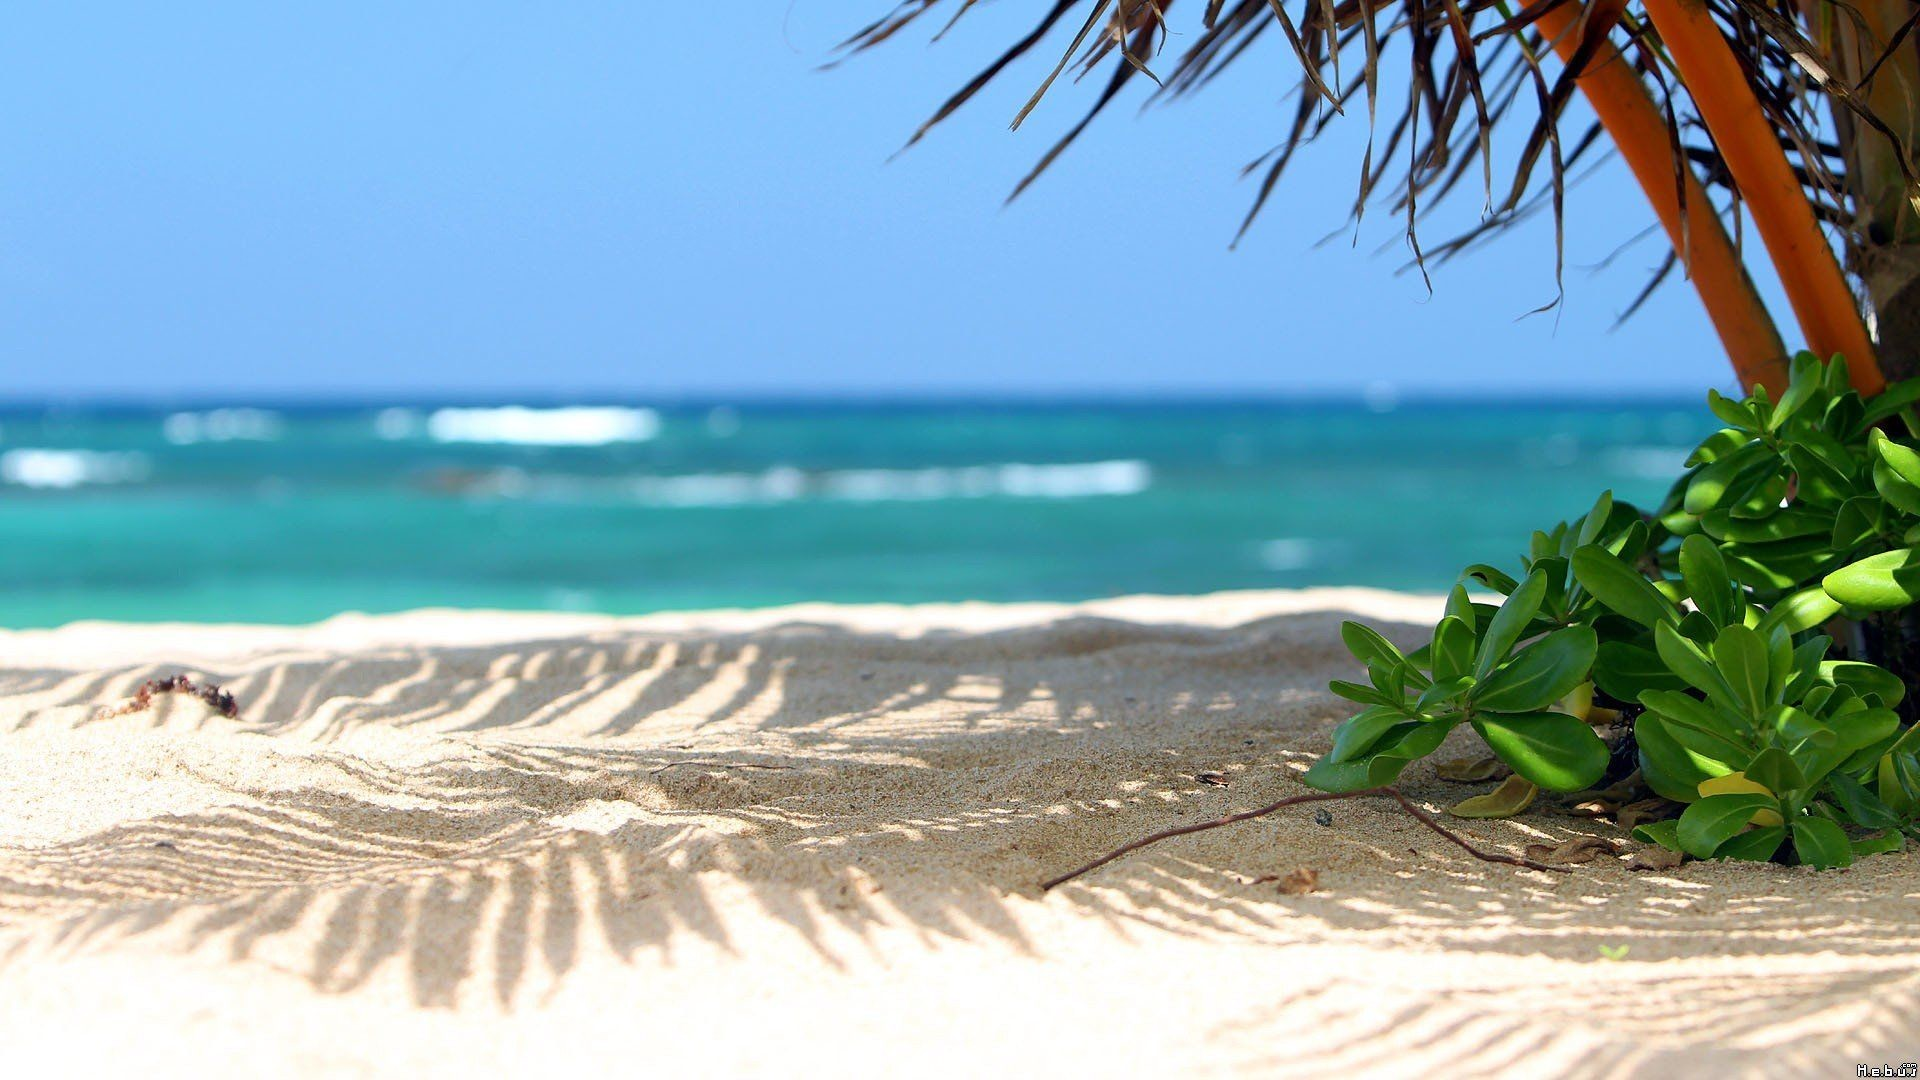 Res: 1920x1080, Beach Scene Wallpaper Desktop Background beach Wallpaper